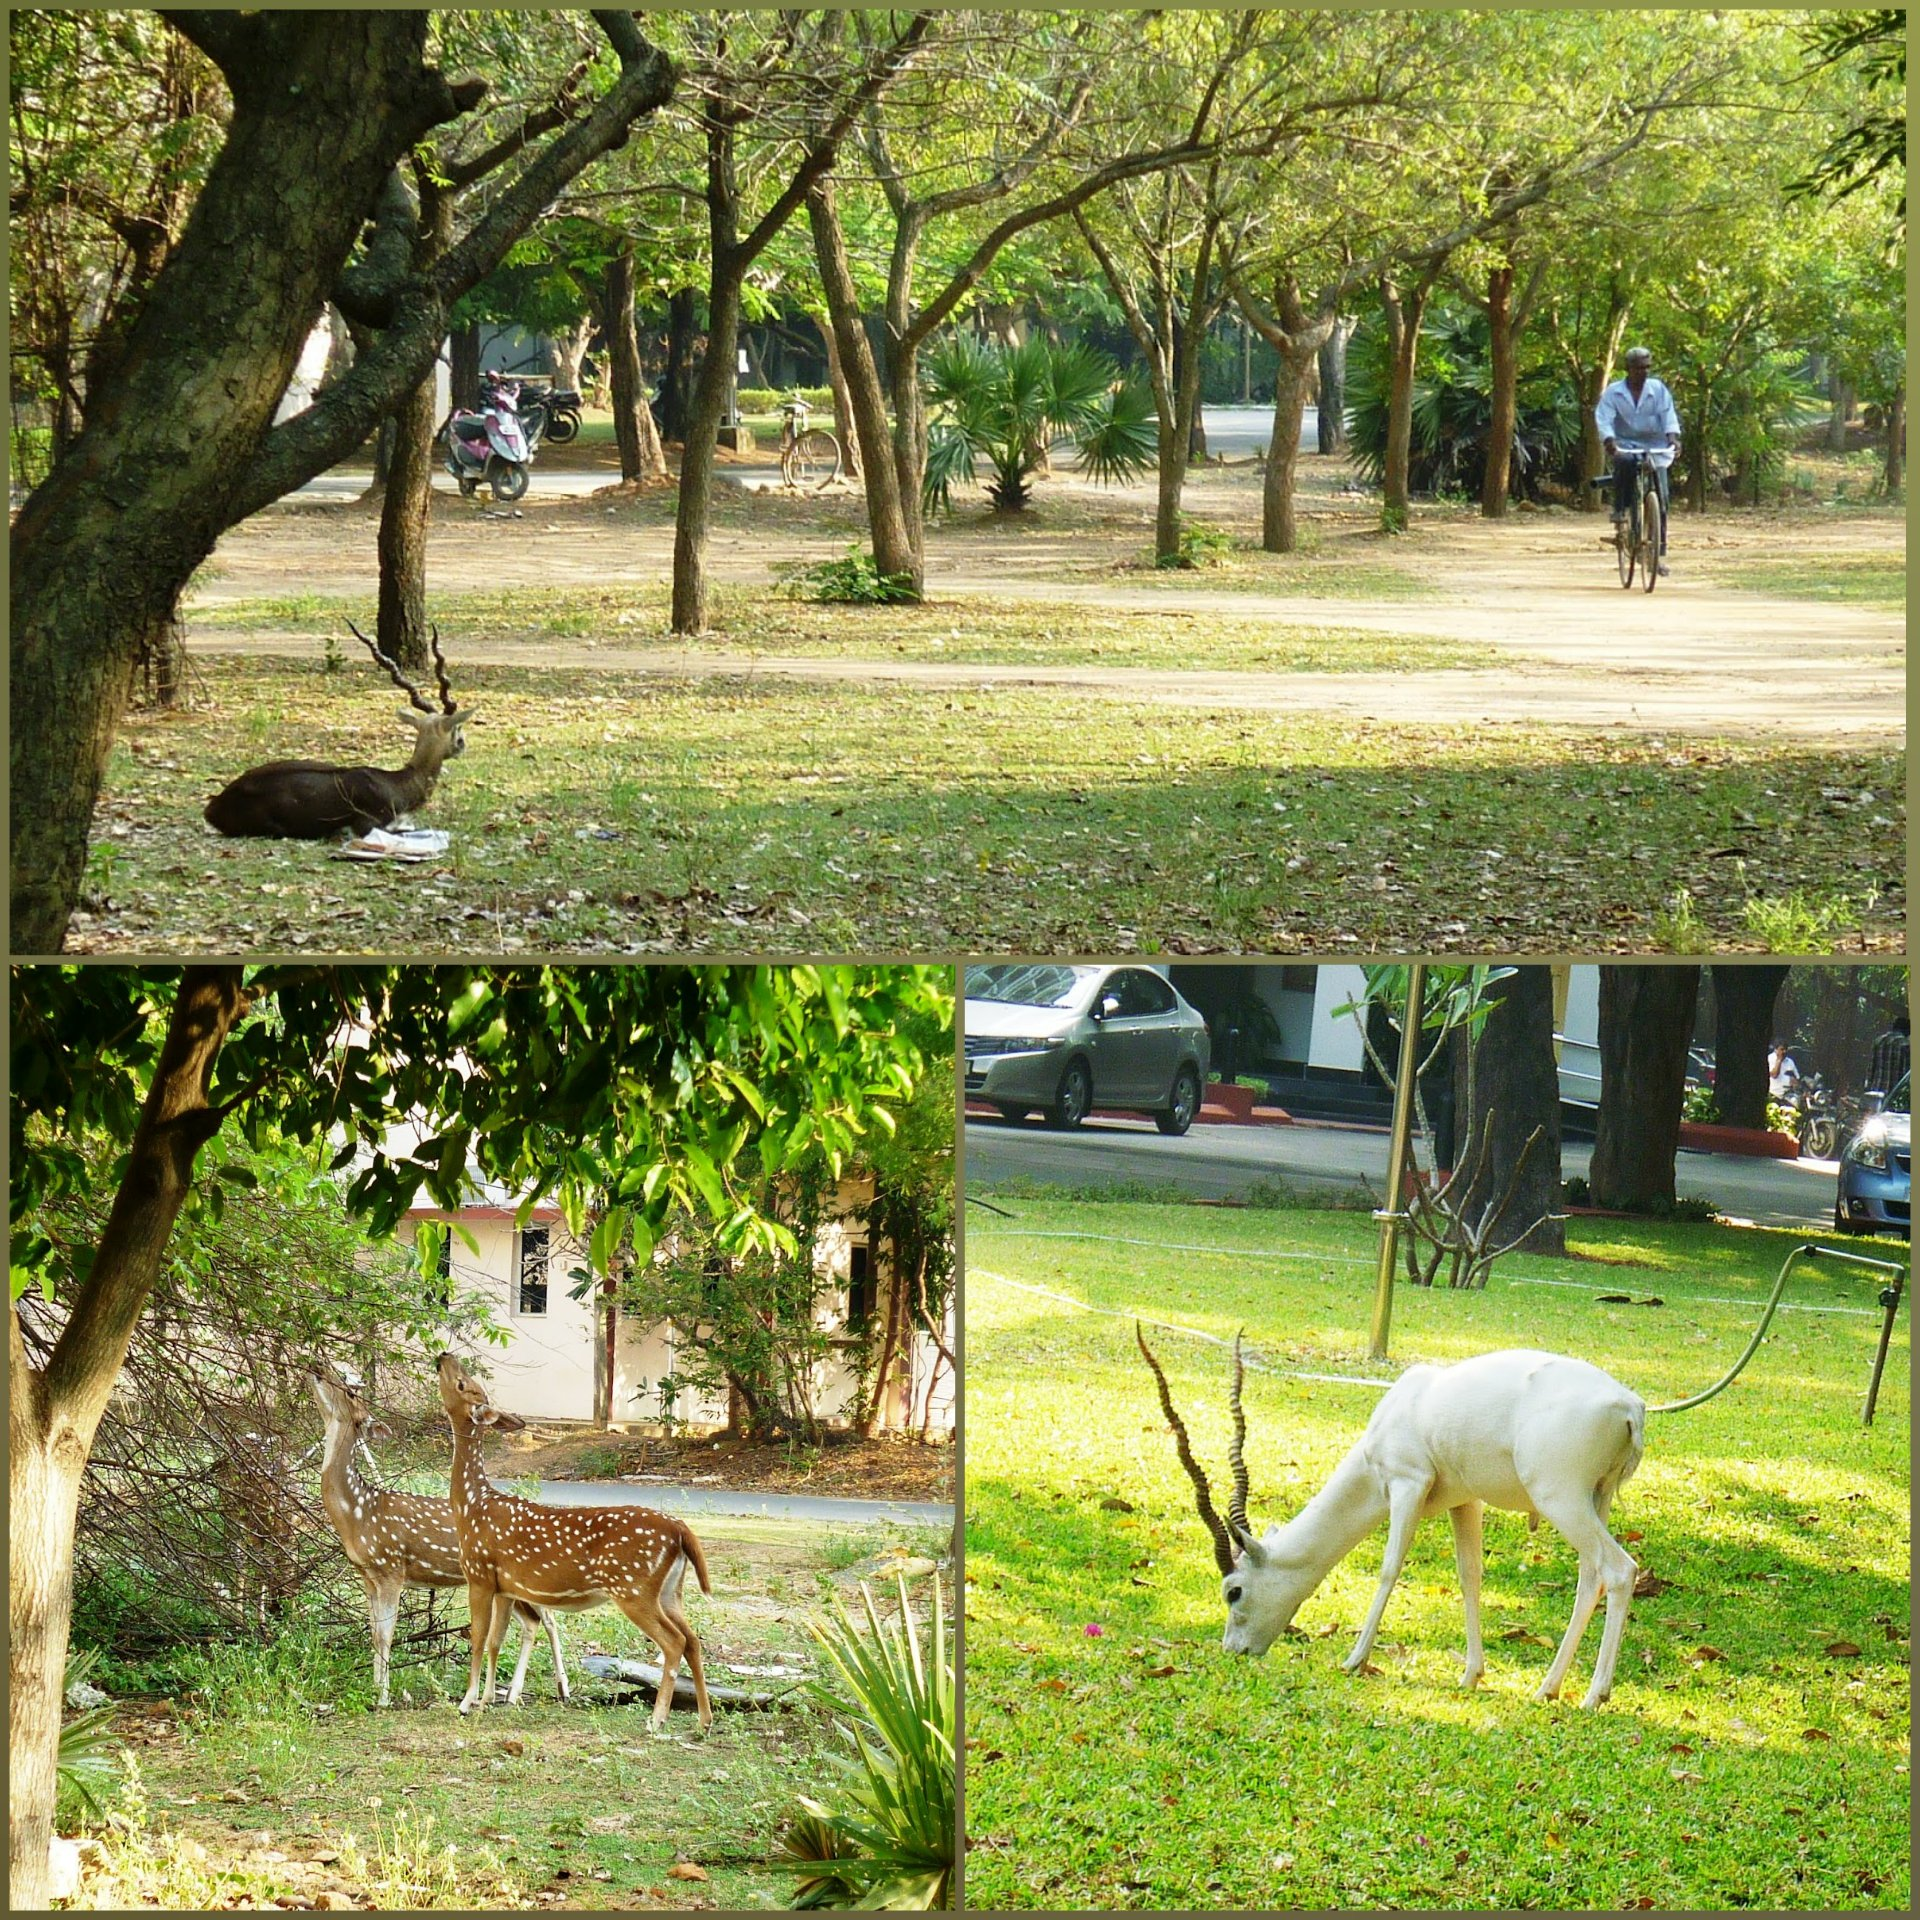 Wildlife at IIT Madras campus